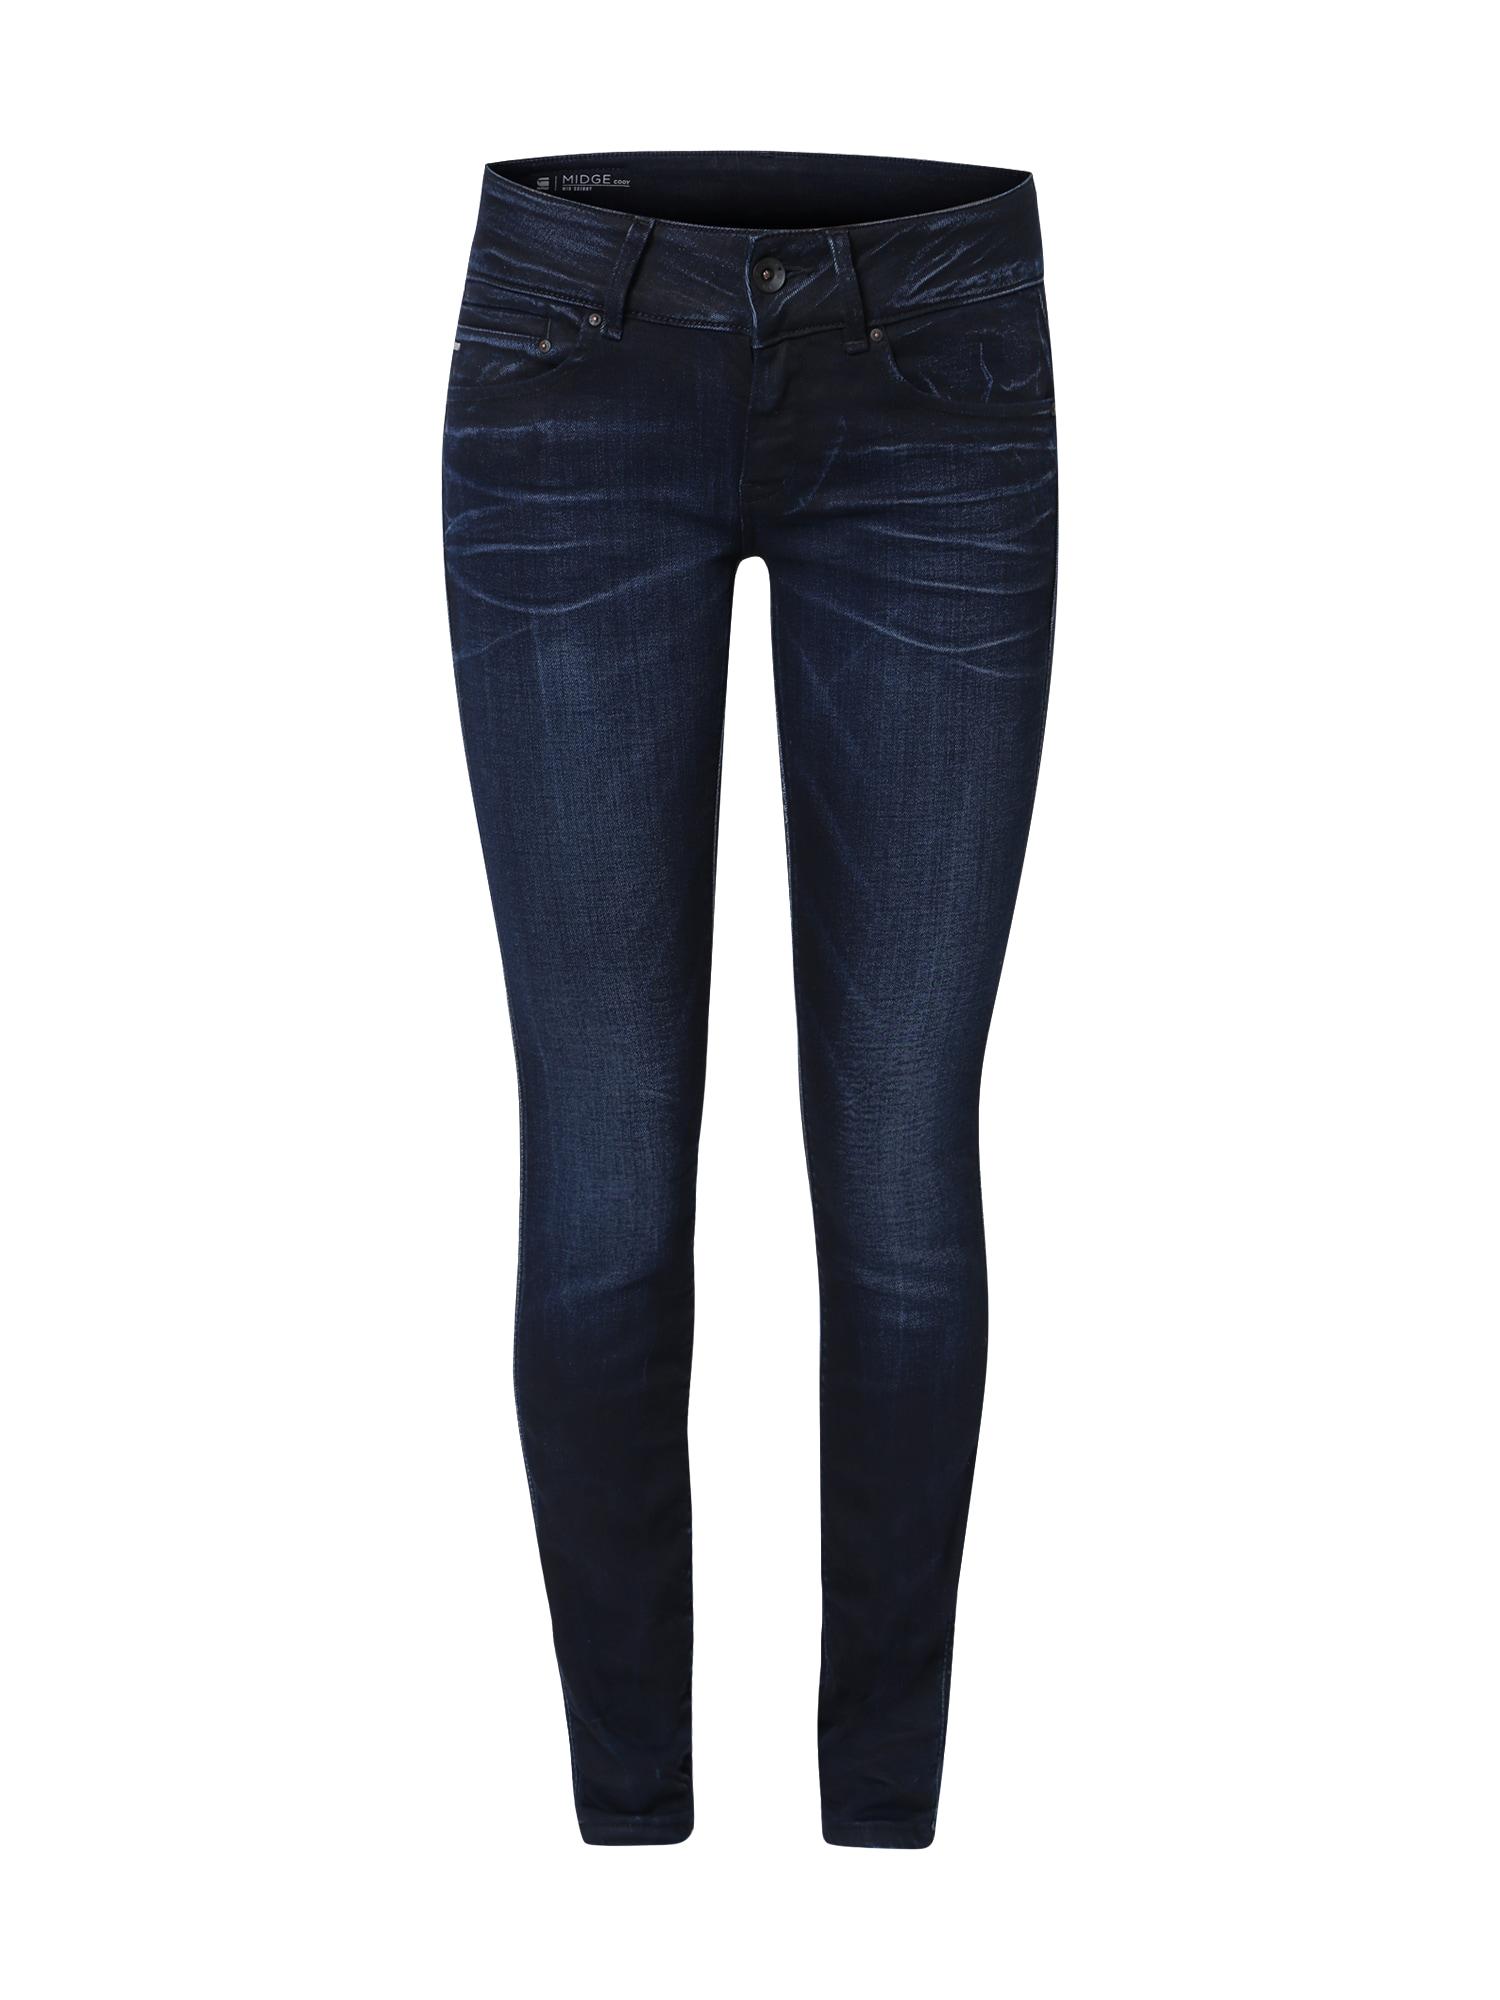 G-STAR RAW Dames Jeans Midge Cody blauw denim